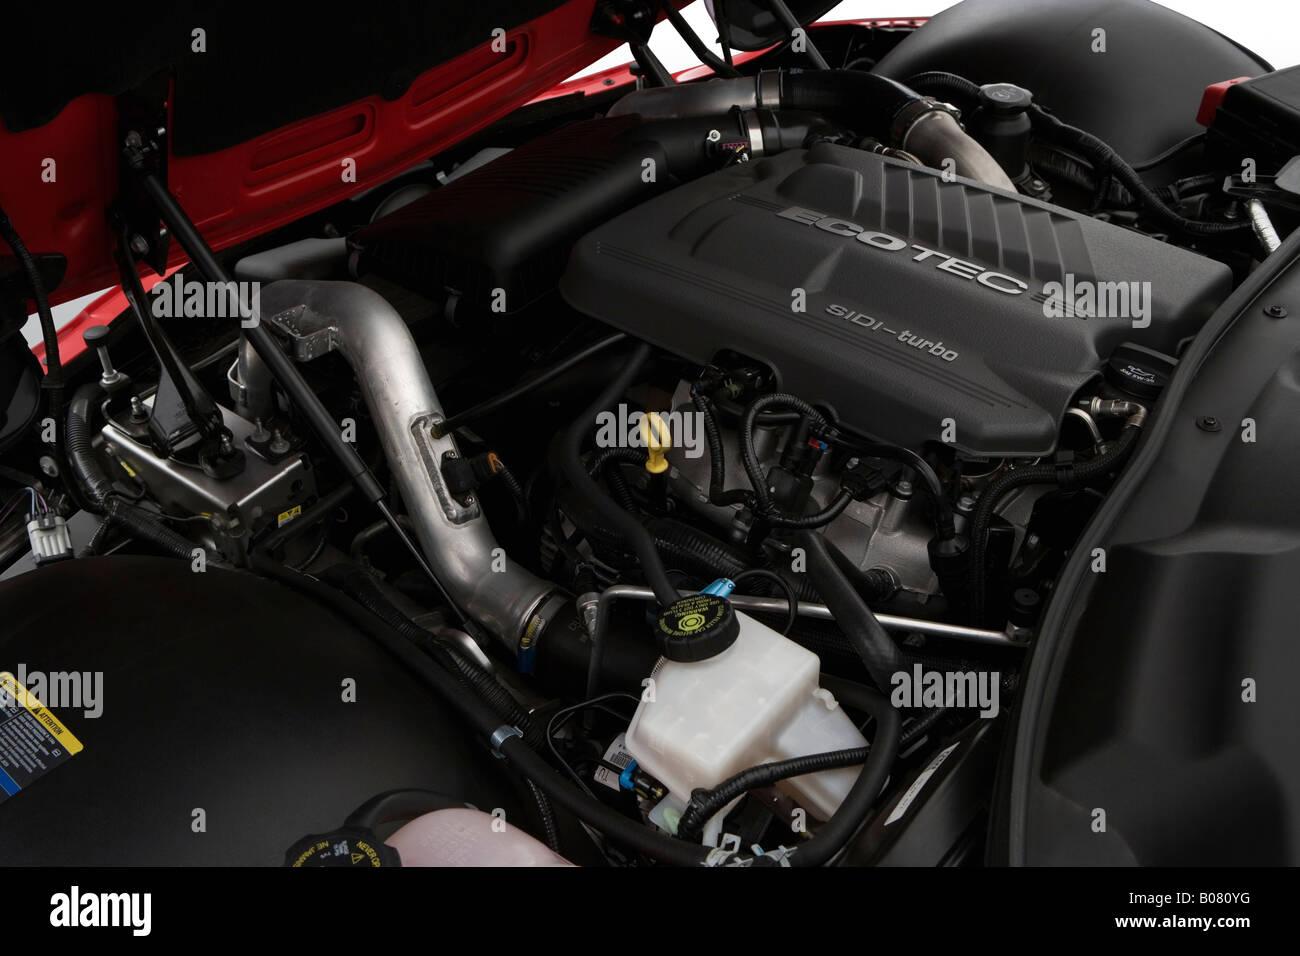 2008 Pontiac Solstice Gxp In Red Engine Stock Photo Alamy